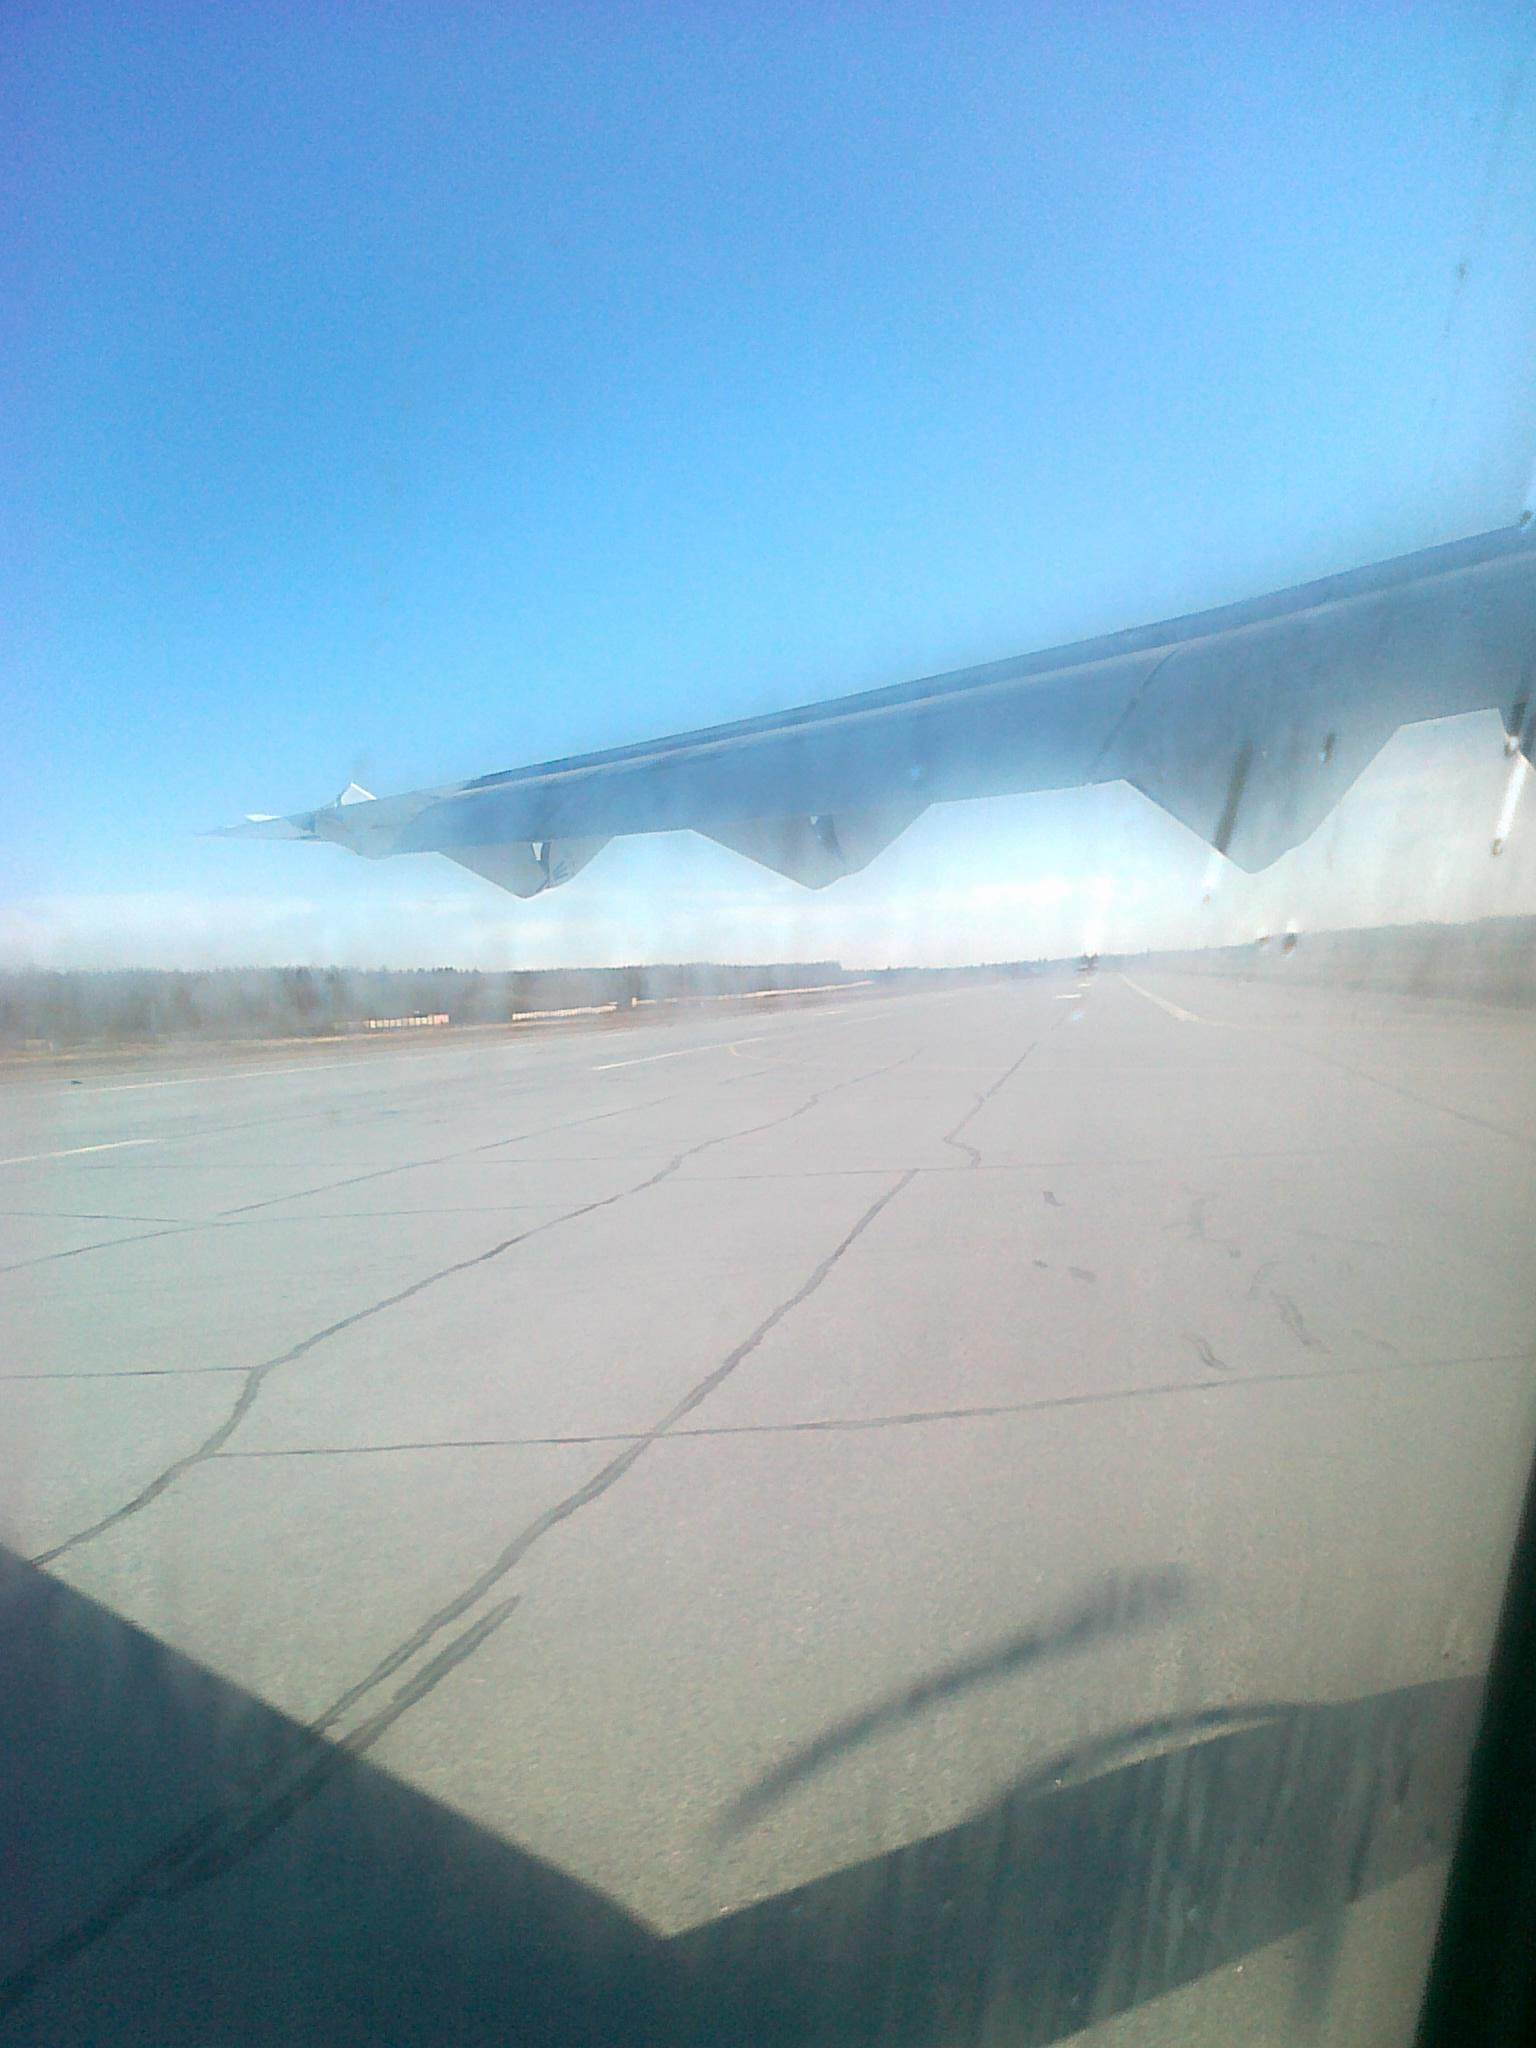 Рейс Тюмень-Ханты-Мансийск авиакомпании ЮТэйр-Экспресс